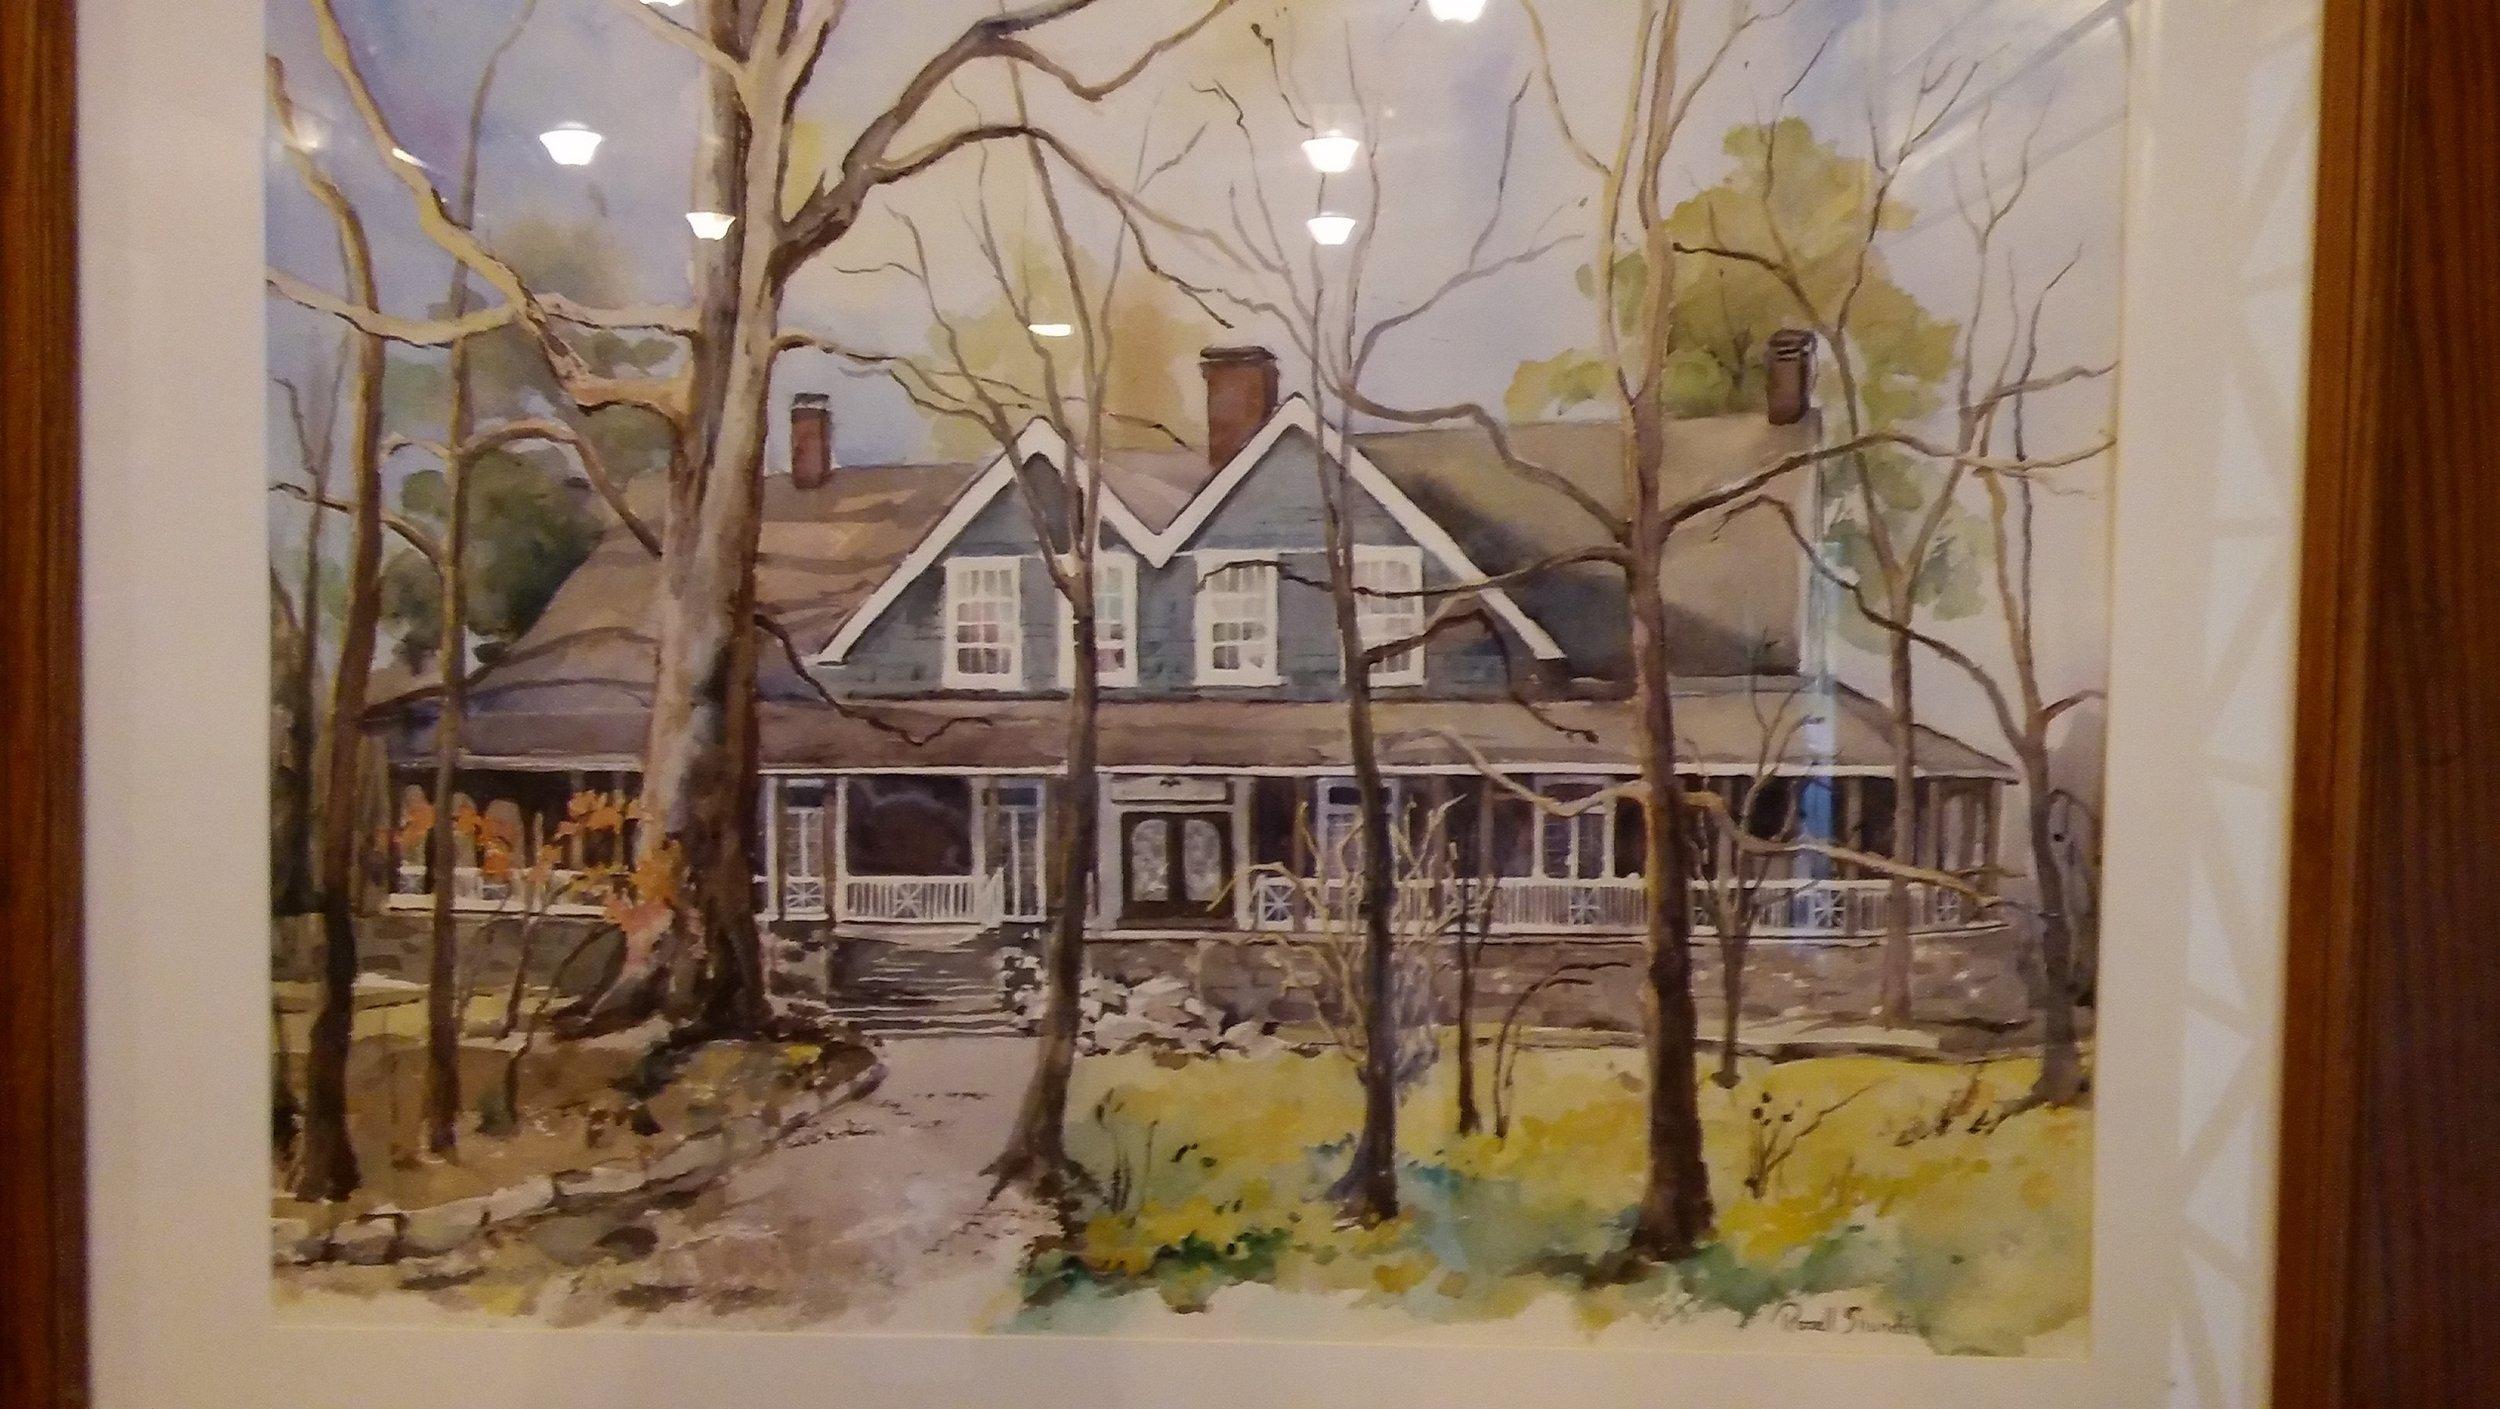 cincy painting of the home.jpg